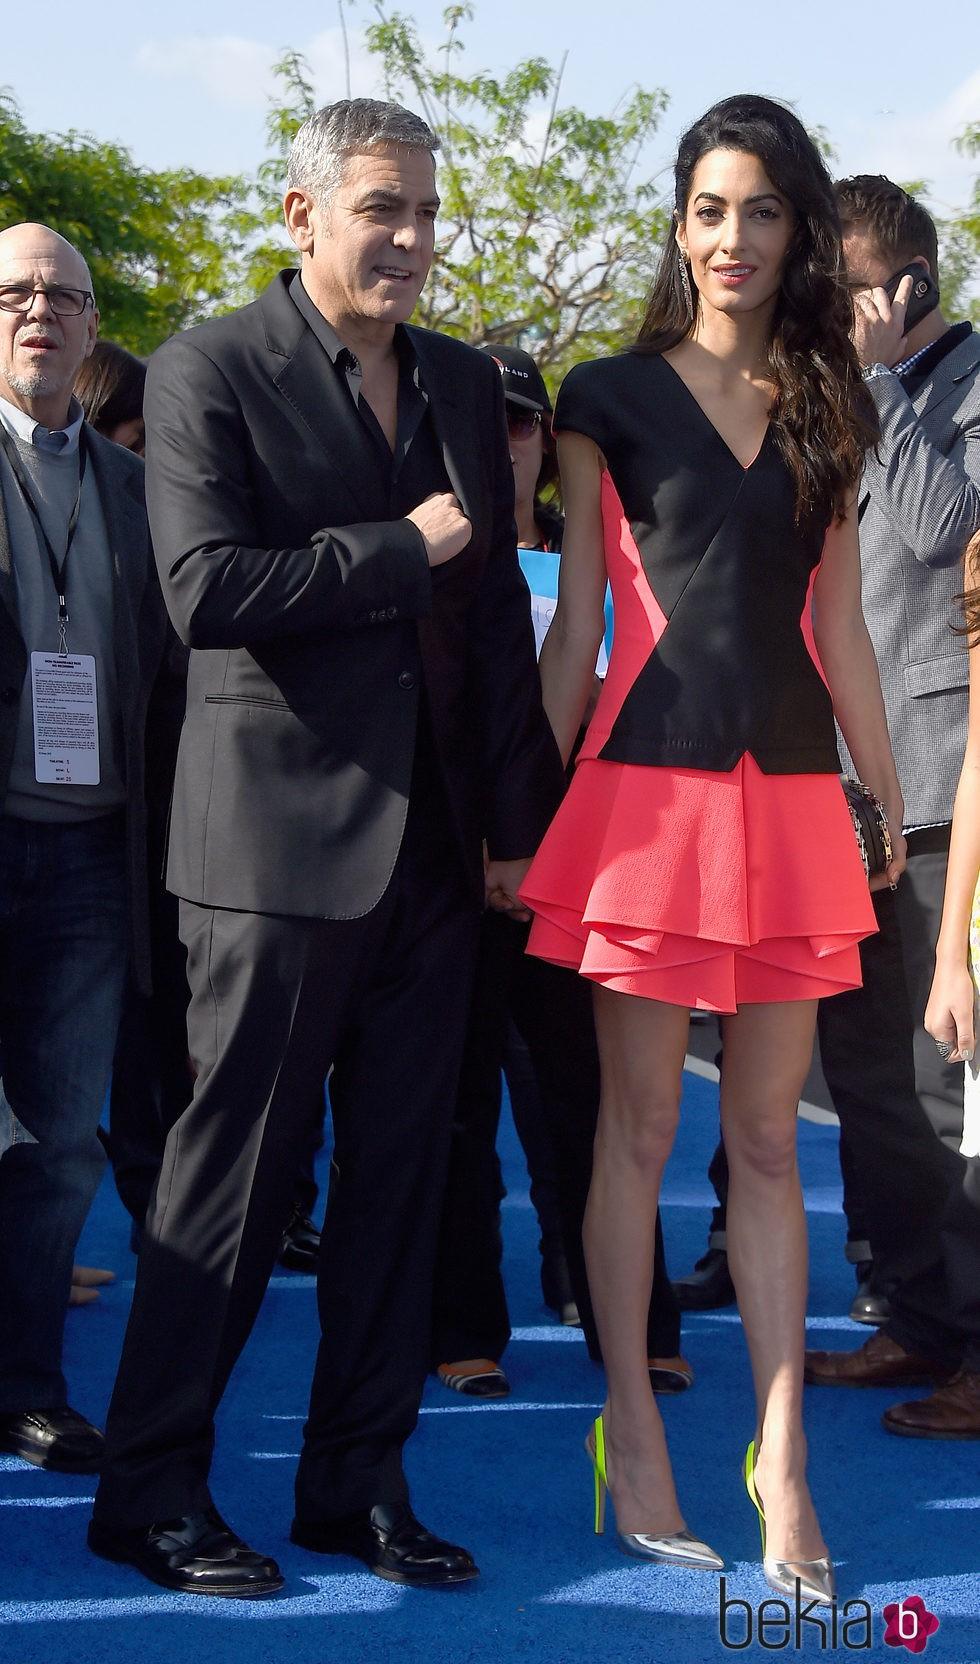 George Clooney y Amal Alamuddin, a su llegada a la premiere de 'Tomorrowland' en Anaheim